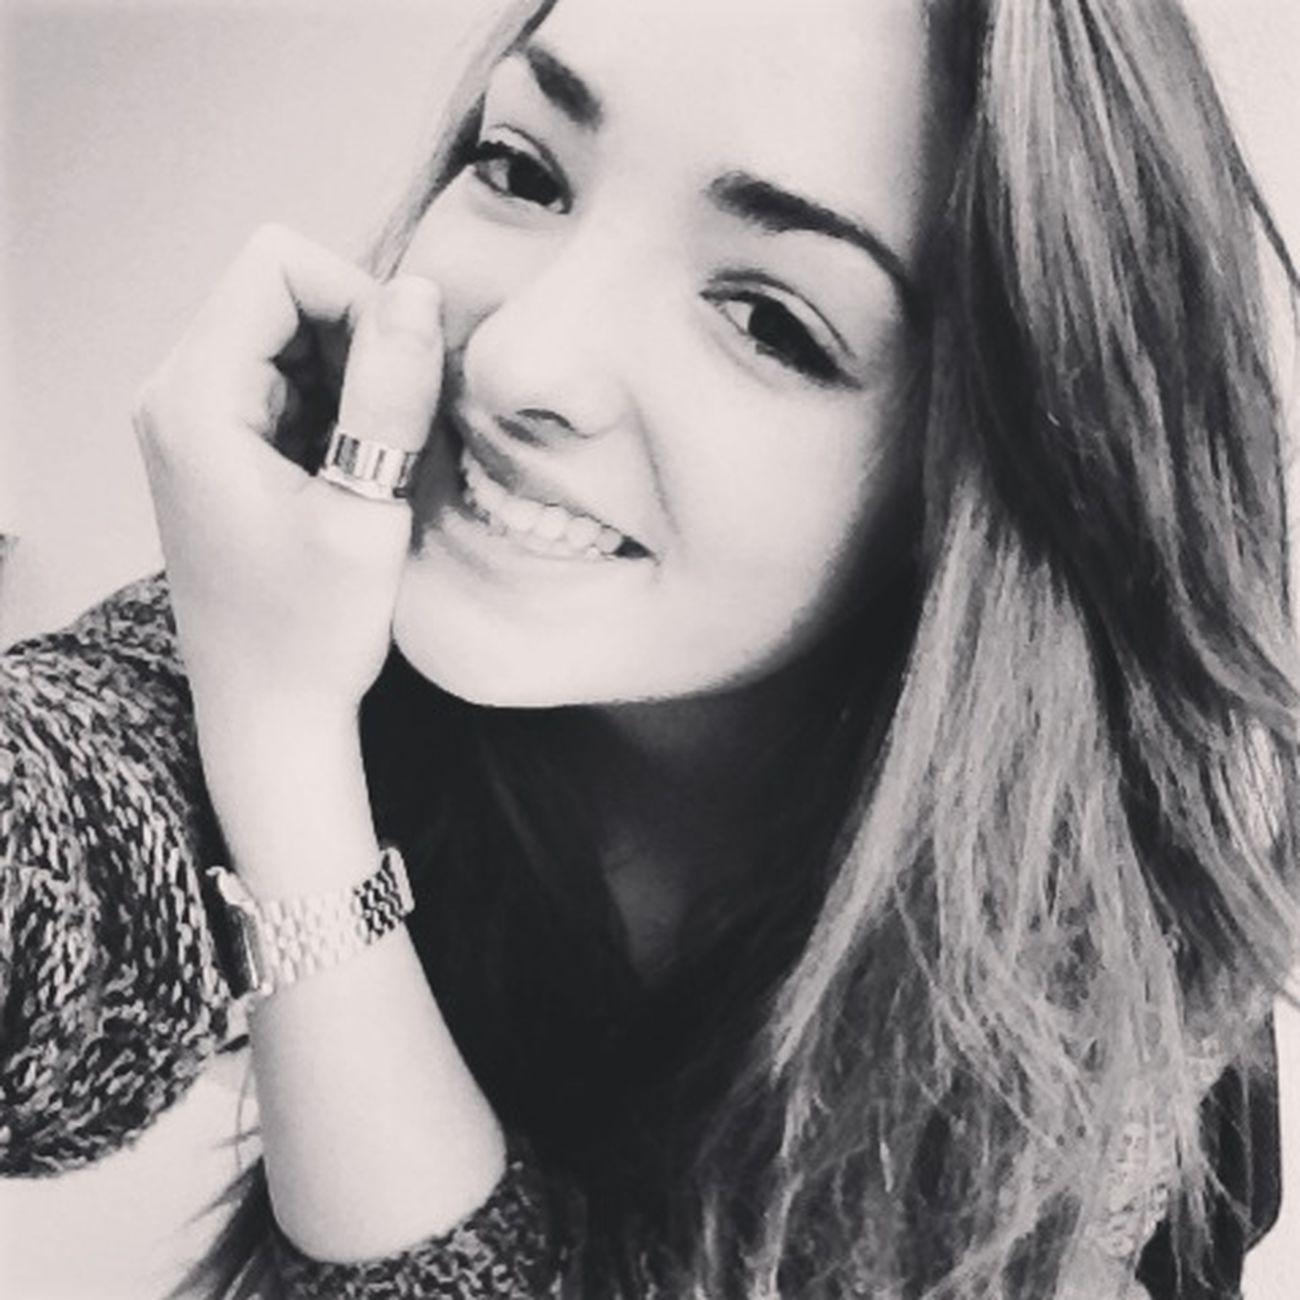 Bedtime Stories Cuddling Smile Selfie >FUCKTHISWORLD, I'm going to wonderland!!